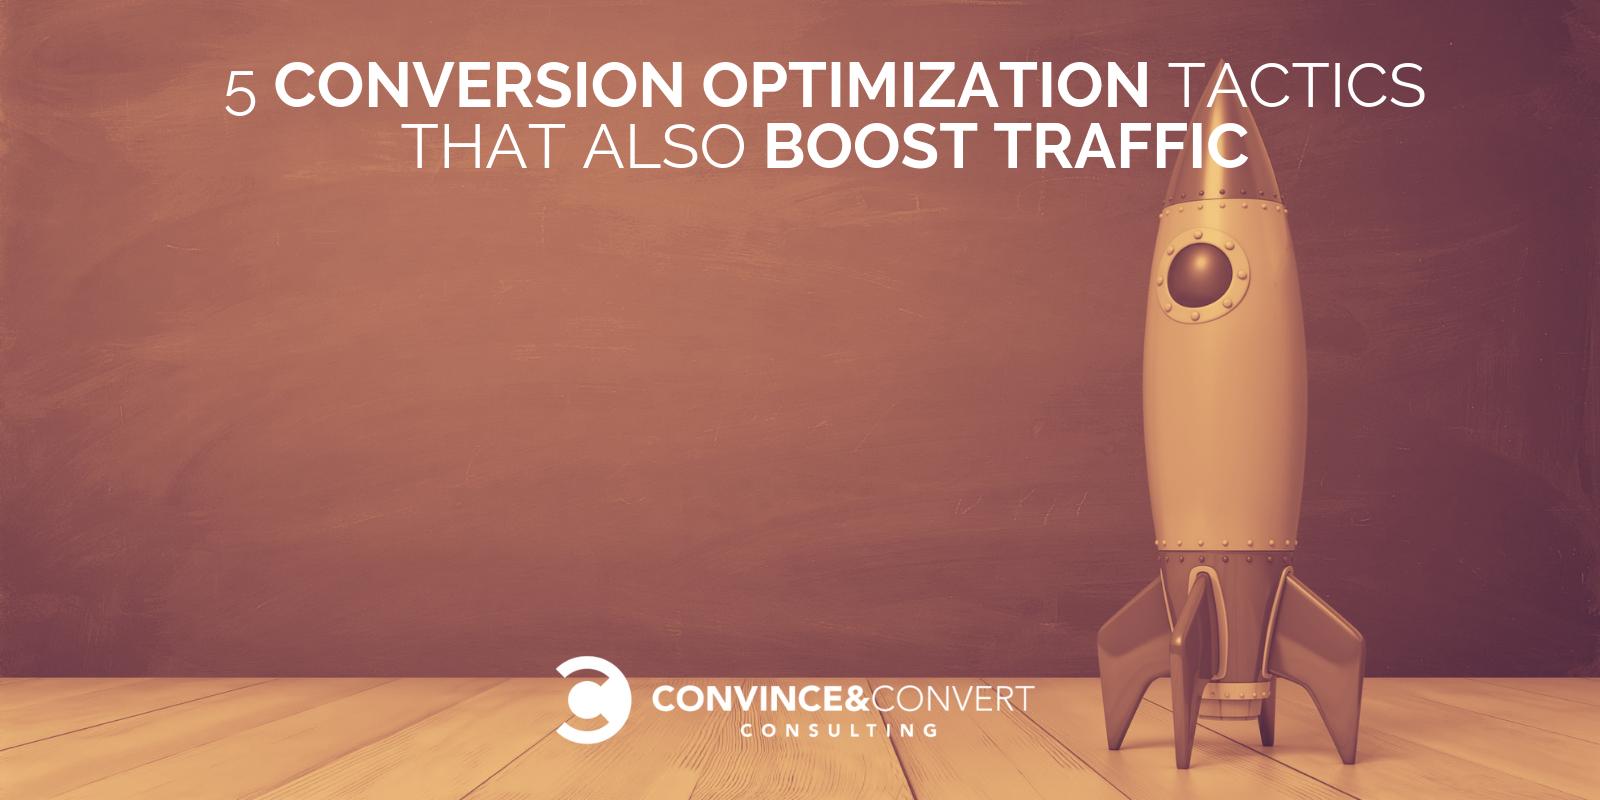 5 Conversion Optimization Tactics that Also Drive Traffic